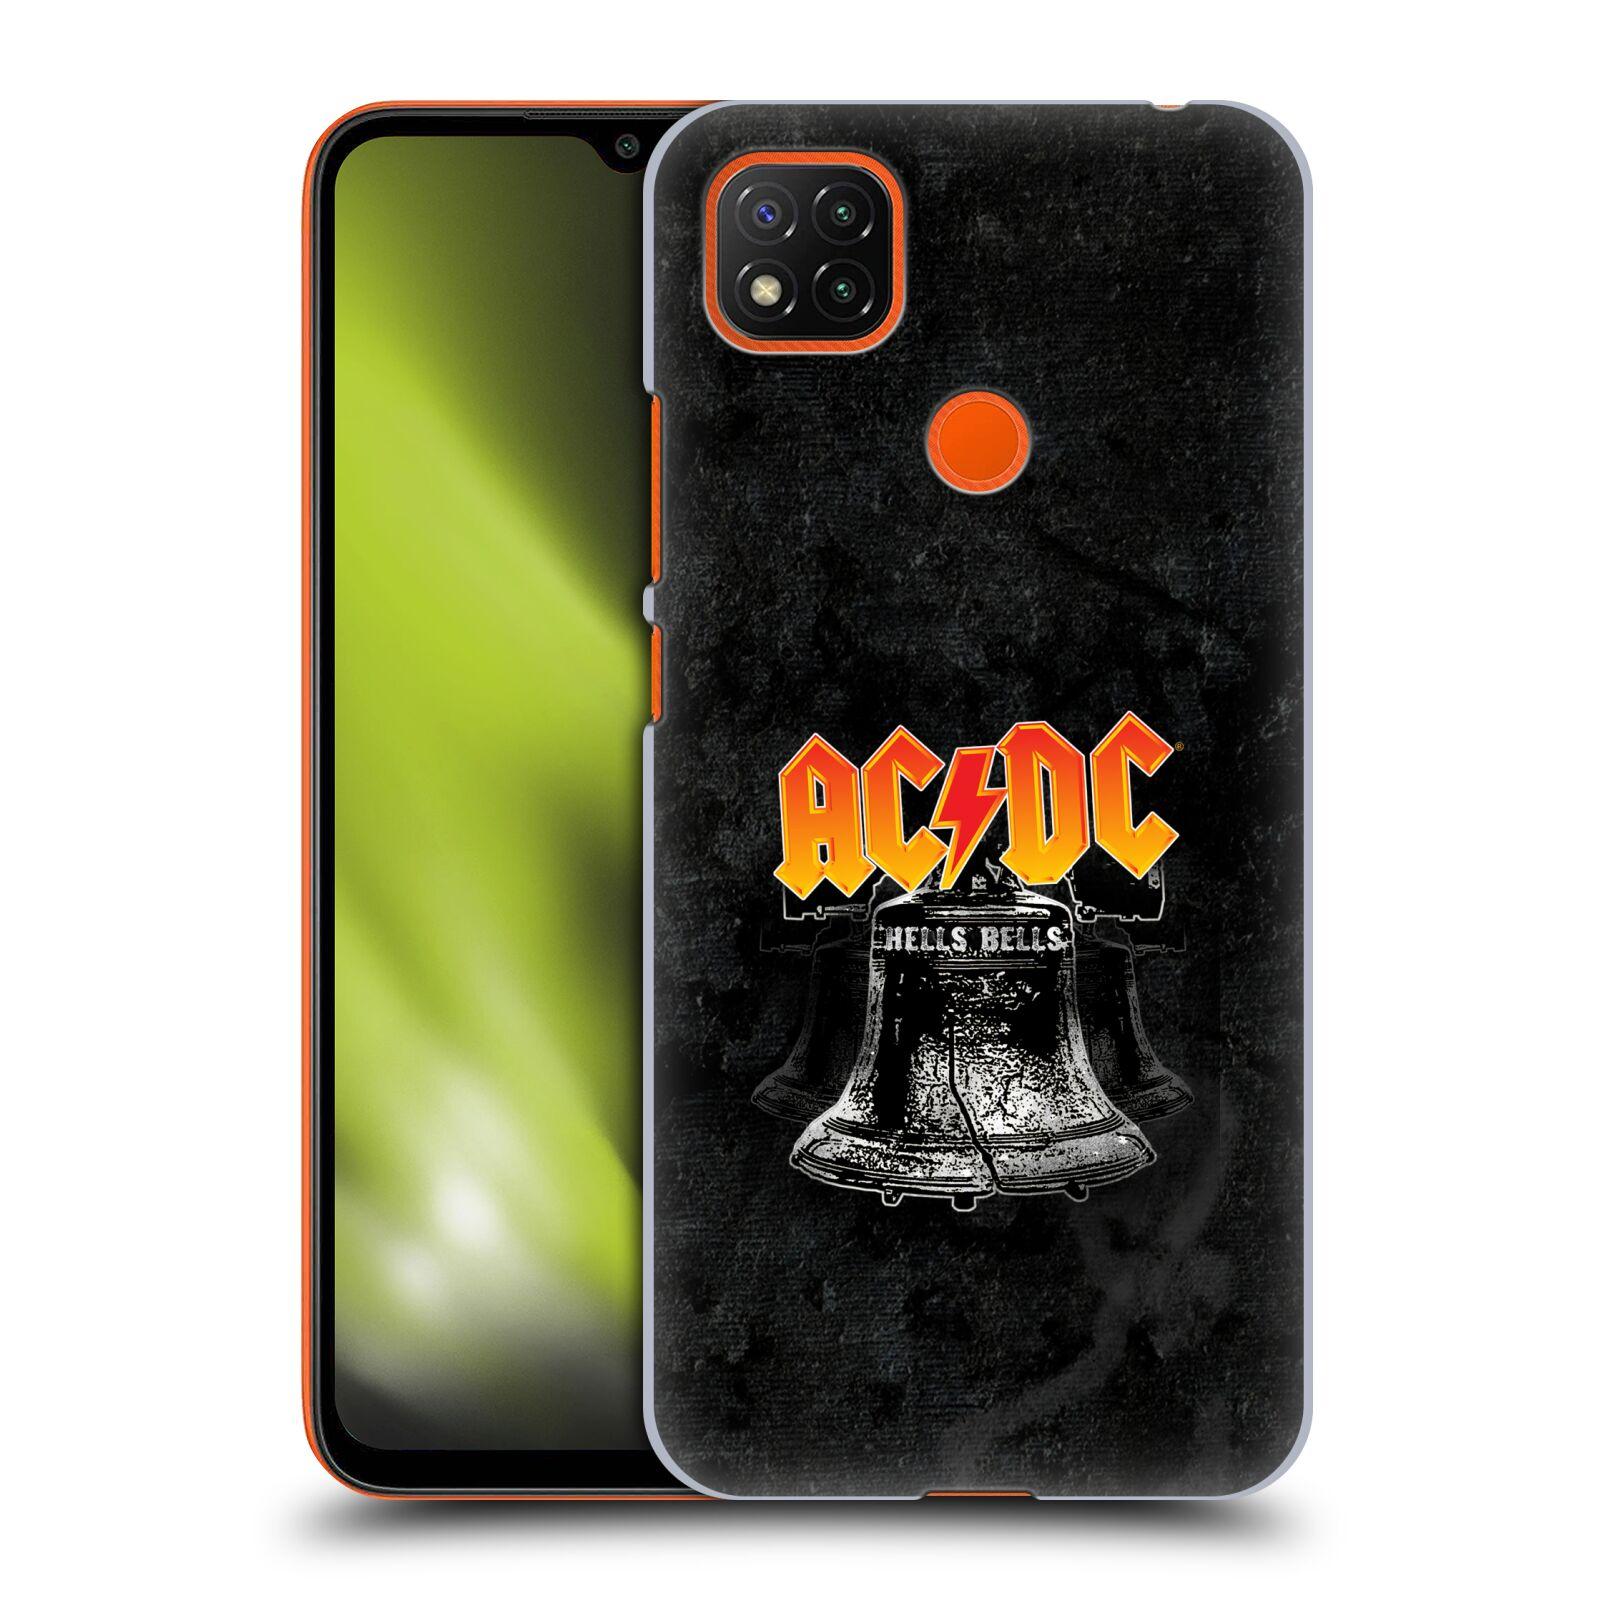 Plastové pouzdro na mobil Xiaomi Redmi 9C - Head Case - AC/DC Hells Bells